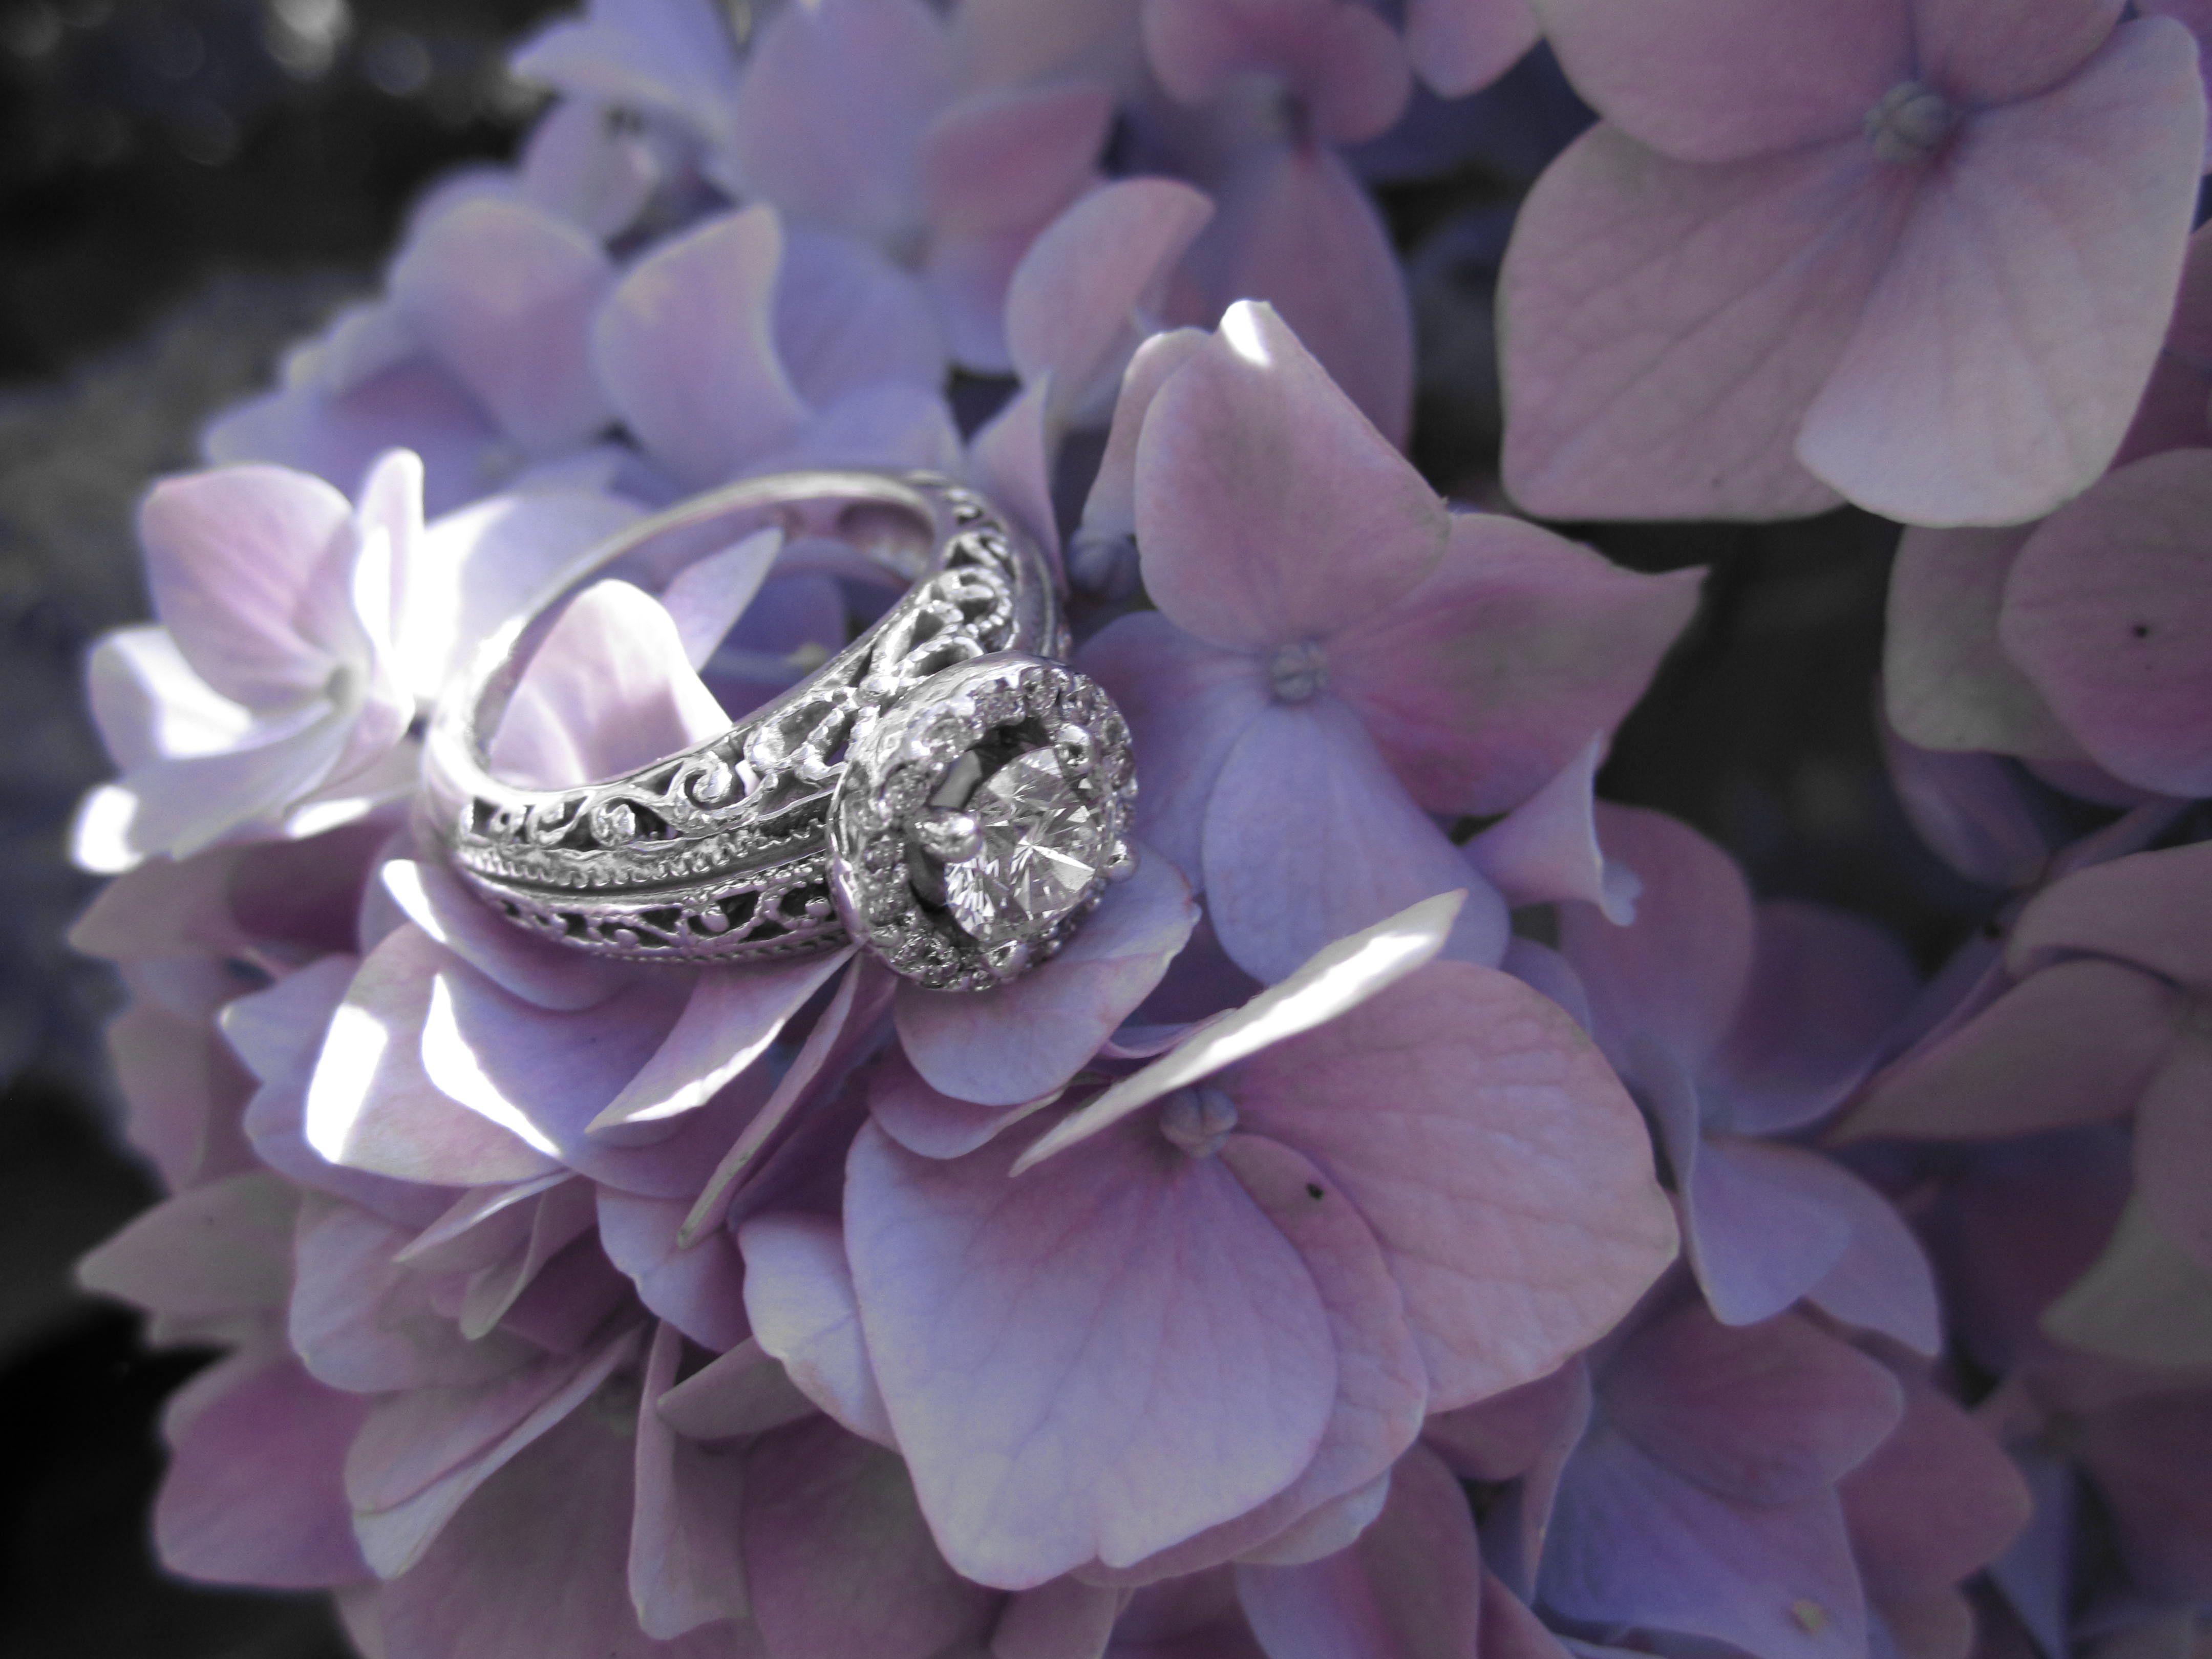 engagement ring.  Filigree is beautiful <3